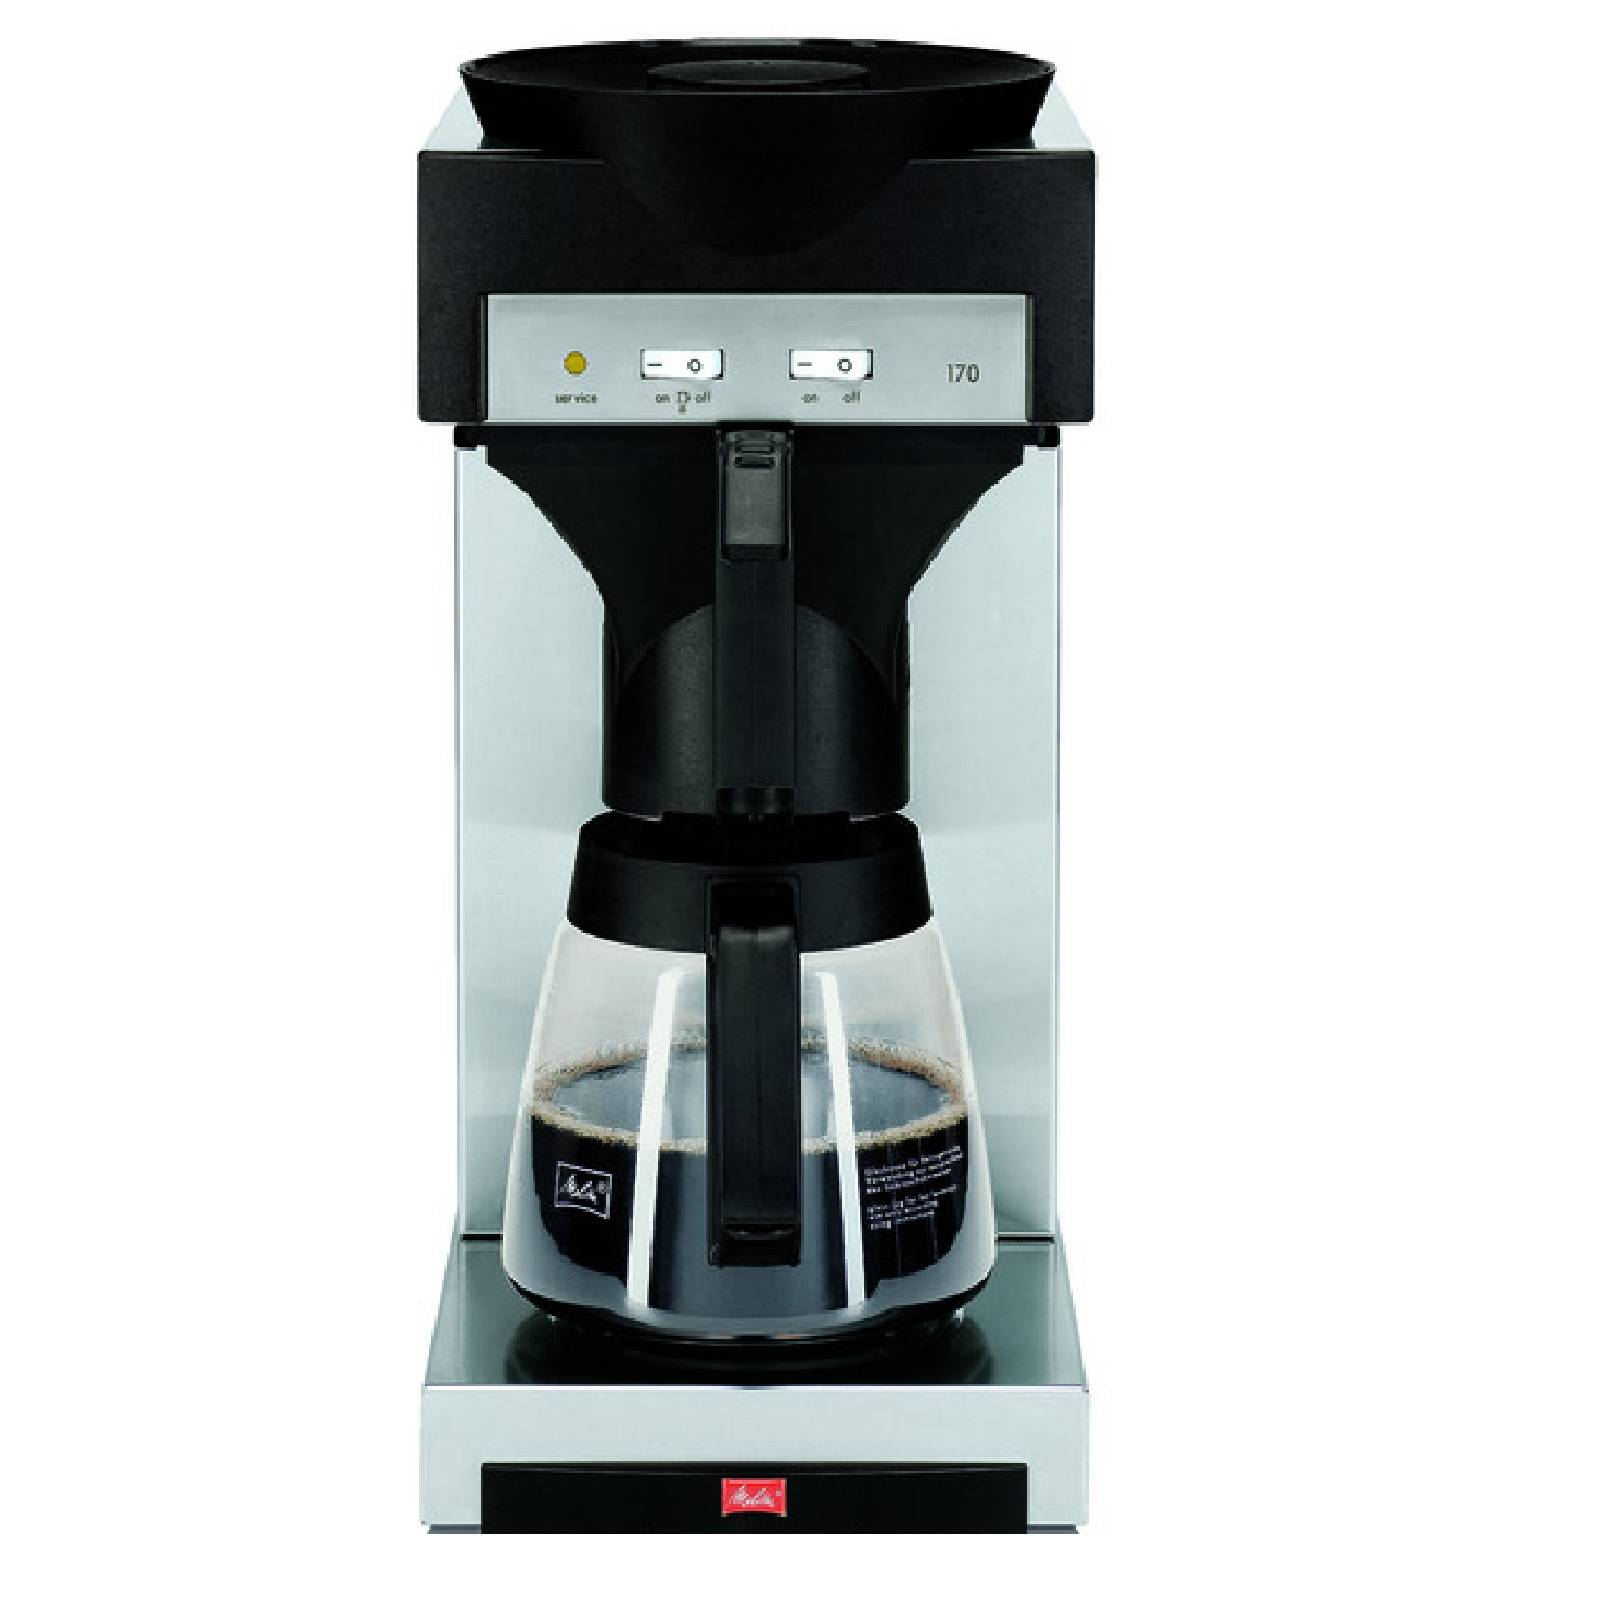 kaffeemaschine ohne filter m bel design idee f r sie. Black Bedroom Furniture Sets. Home Design Ideas